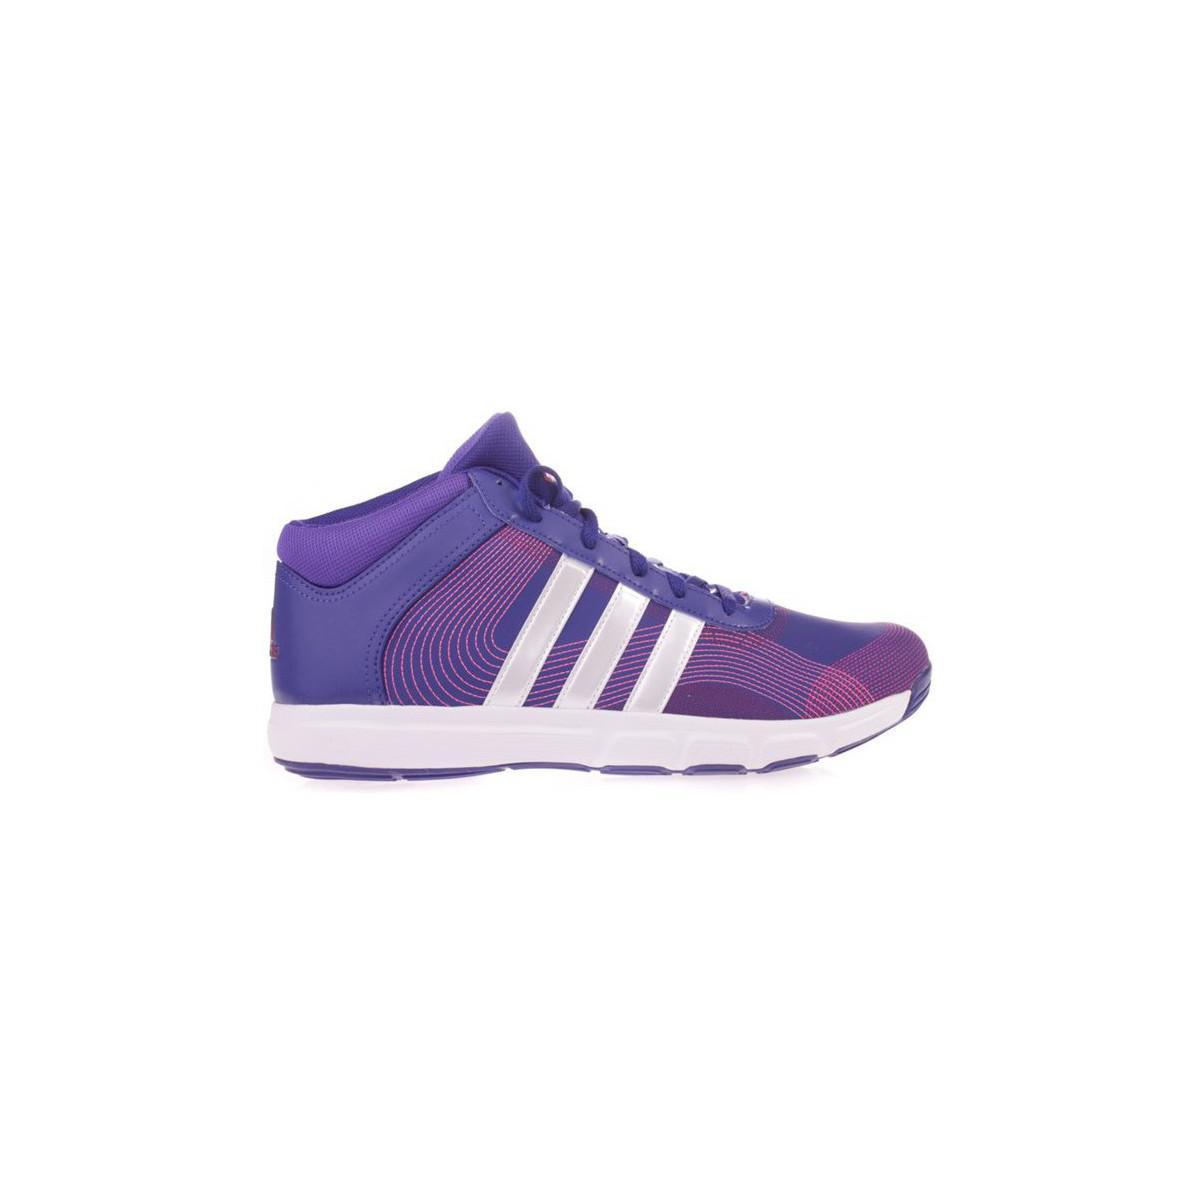 74b9235e3bee9 Adidas Essential Star Mid Women s Trainers In Purple in Purple - Lyst